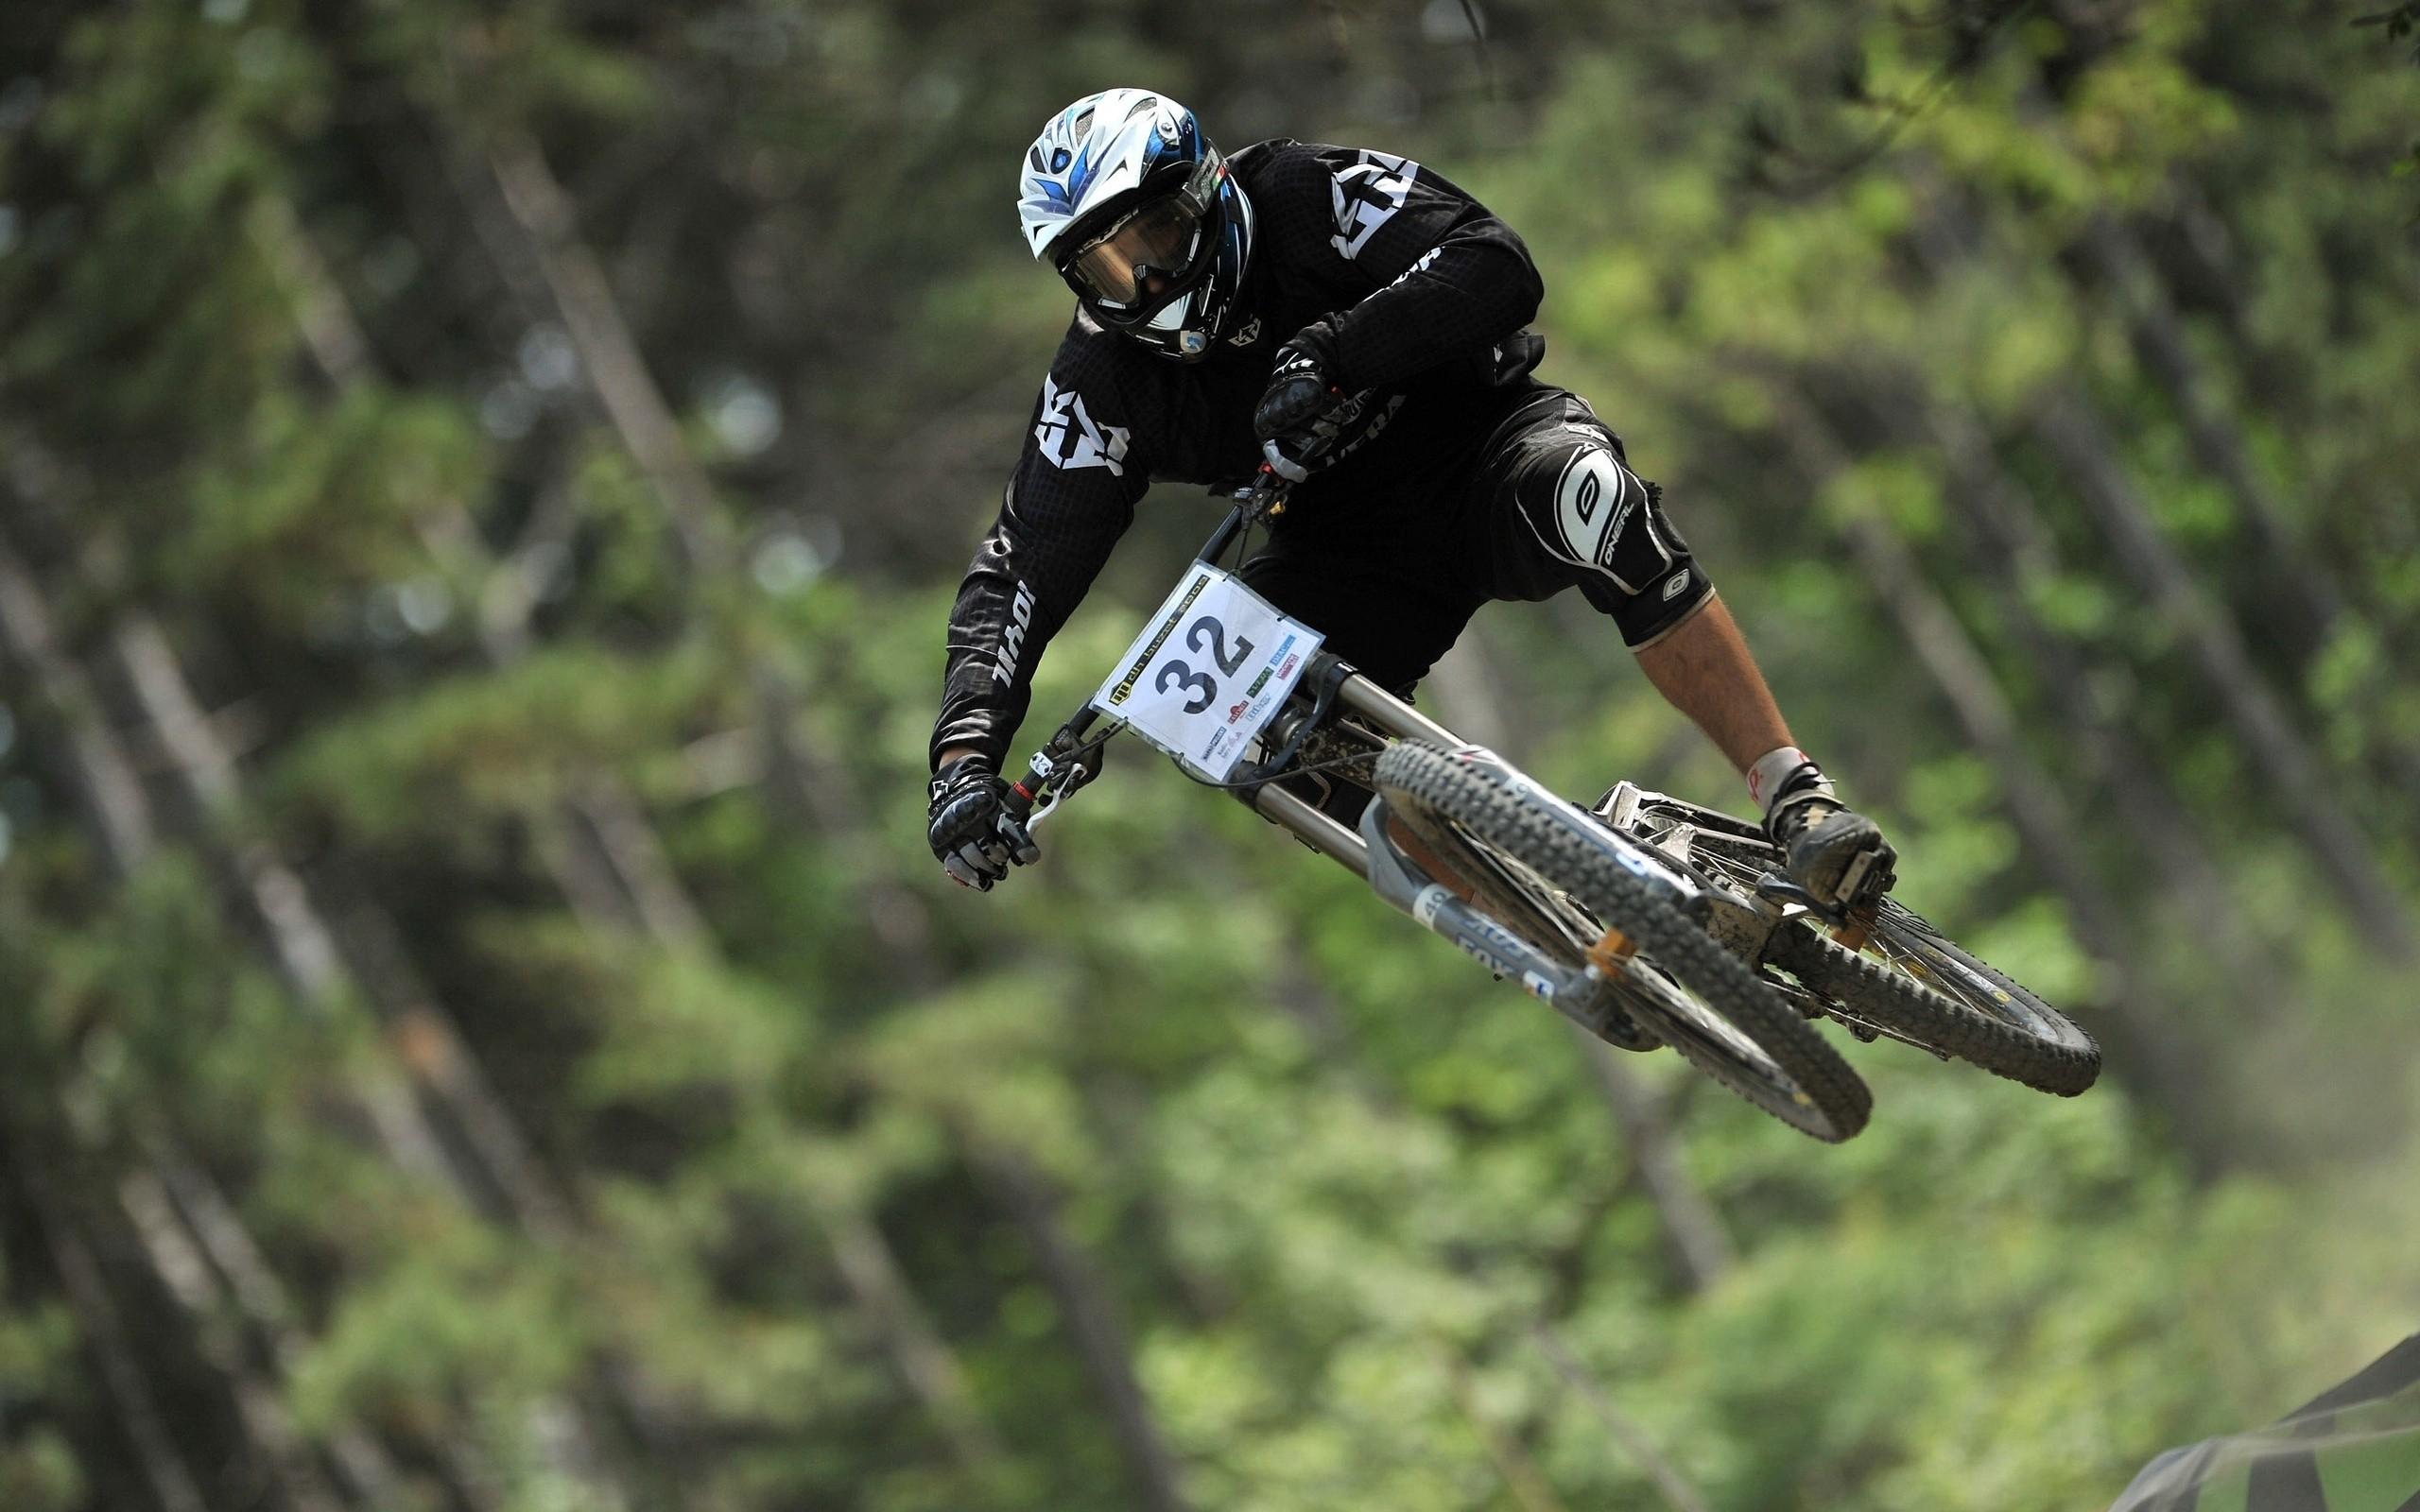 Wallpaper Jumping Vehicle Mountain Bikes Downhill